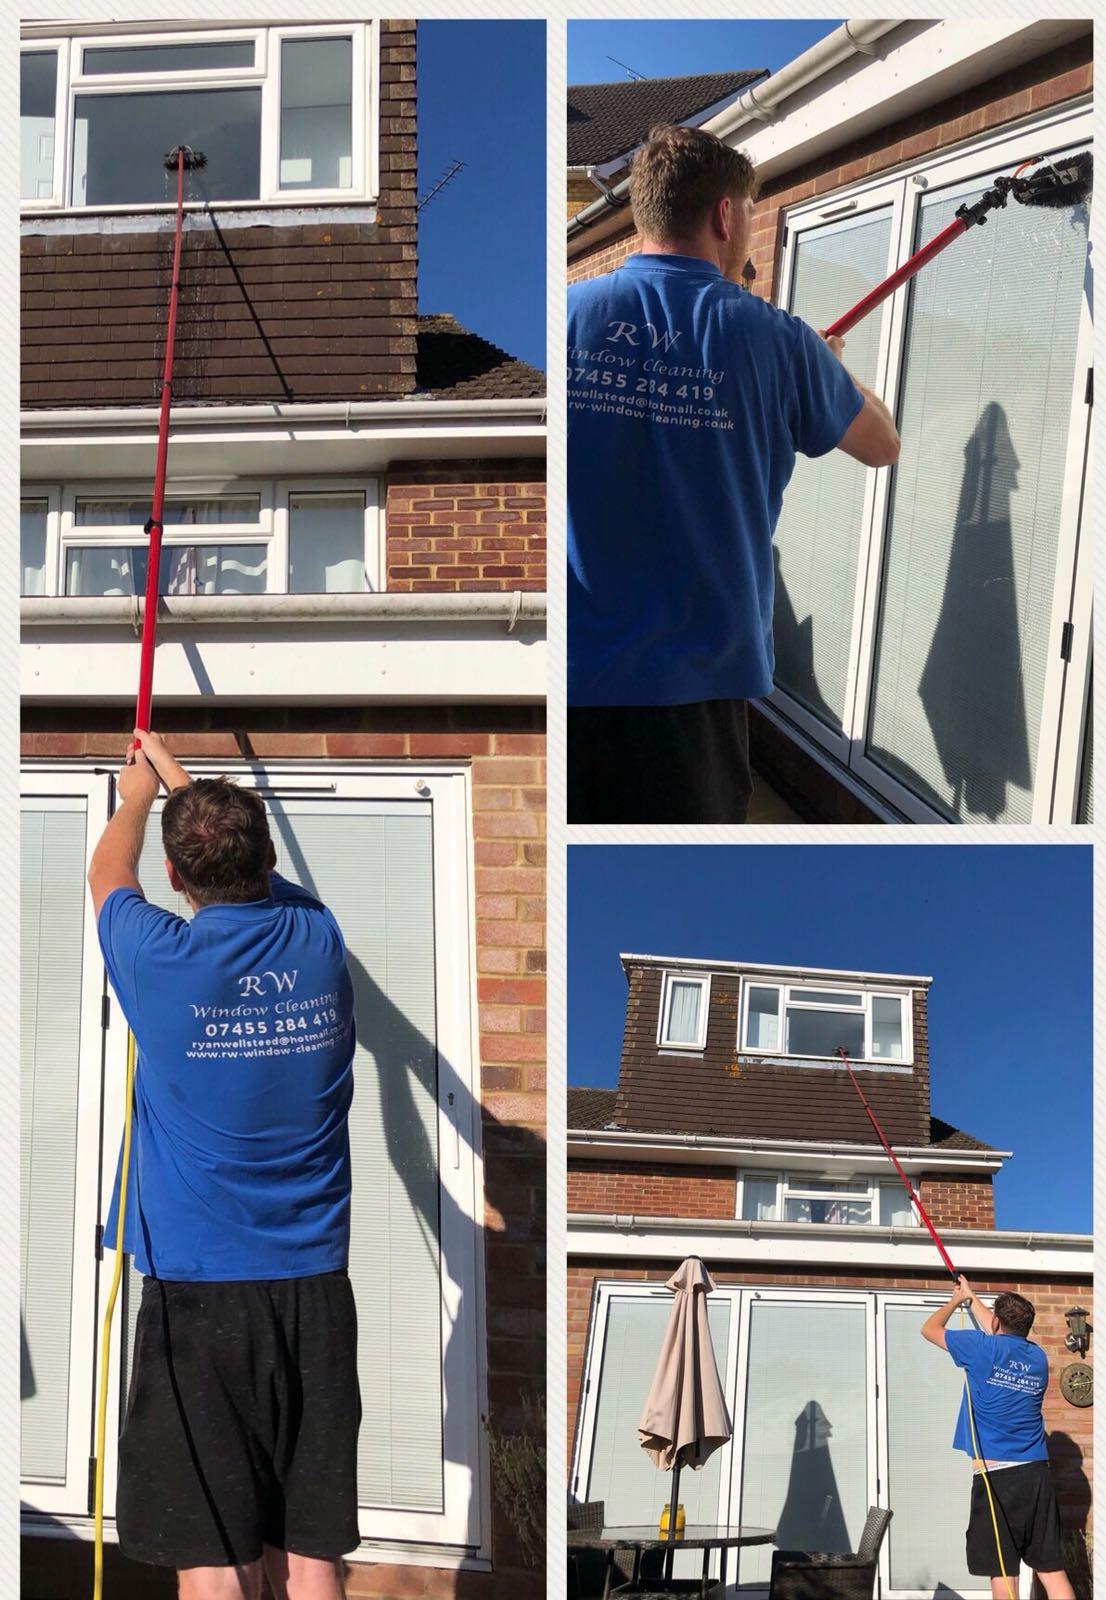 RW Window Cleaning